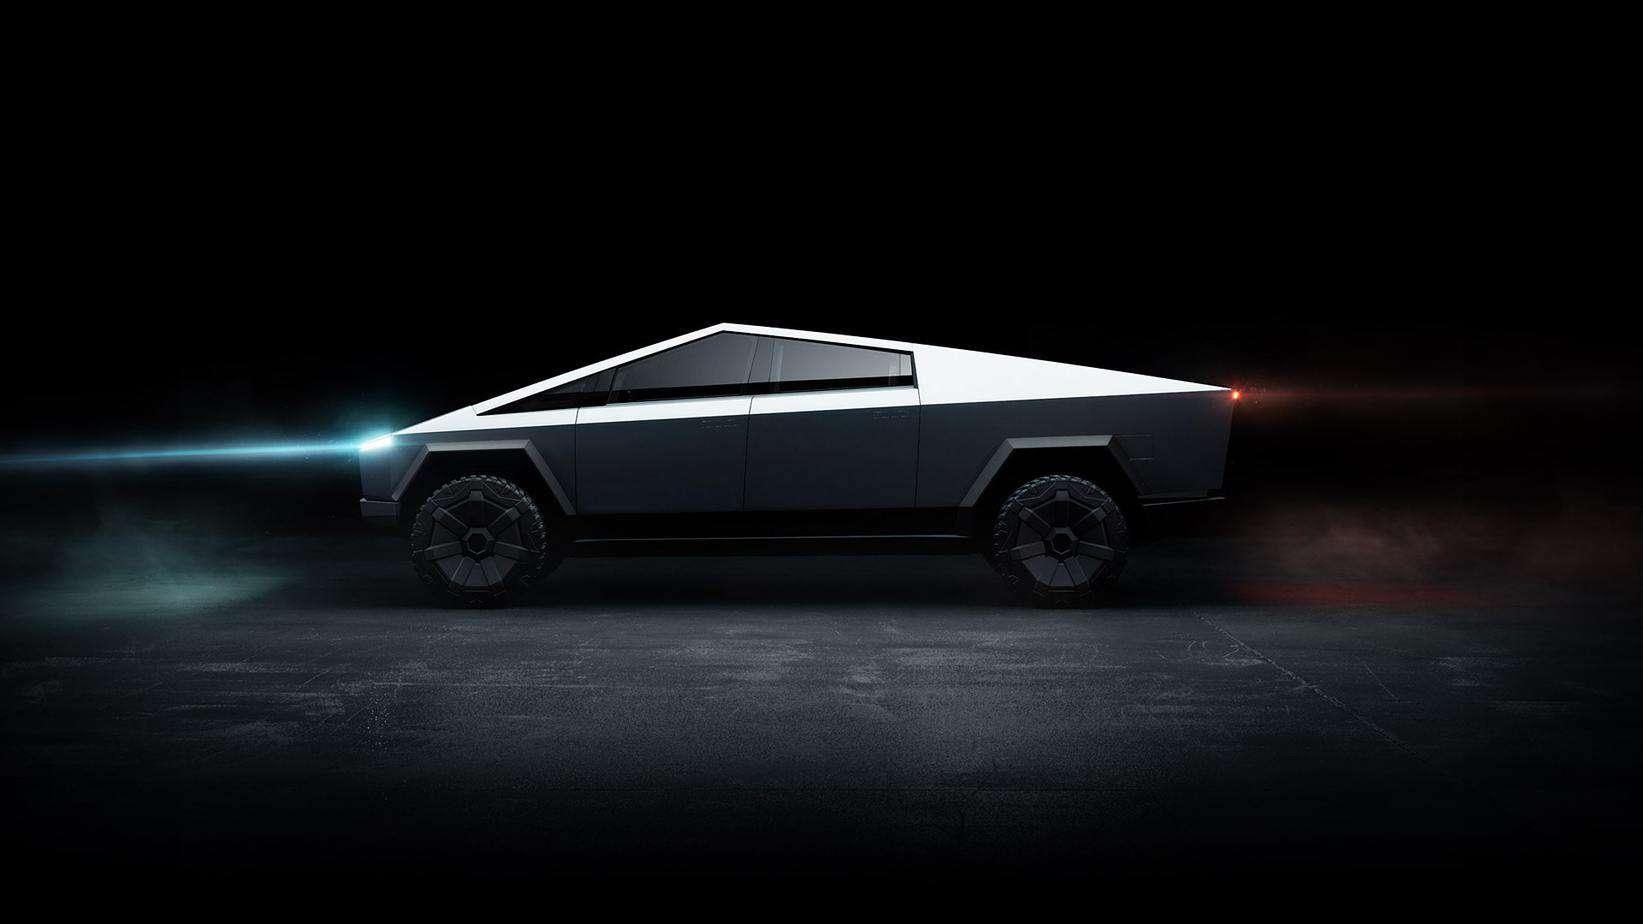 Tesla-Cybertruck-008-1080